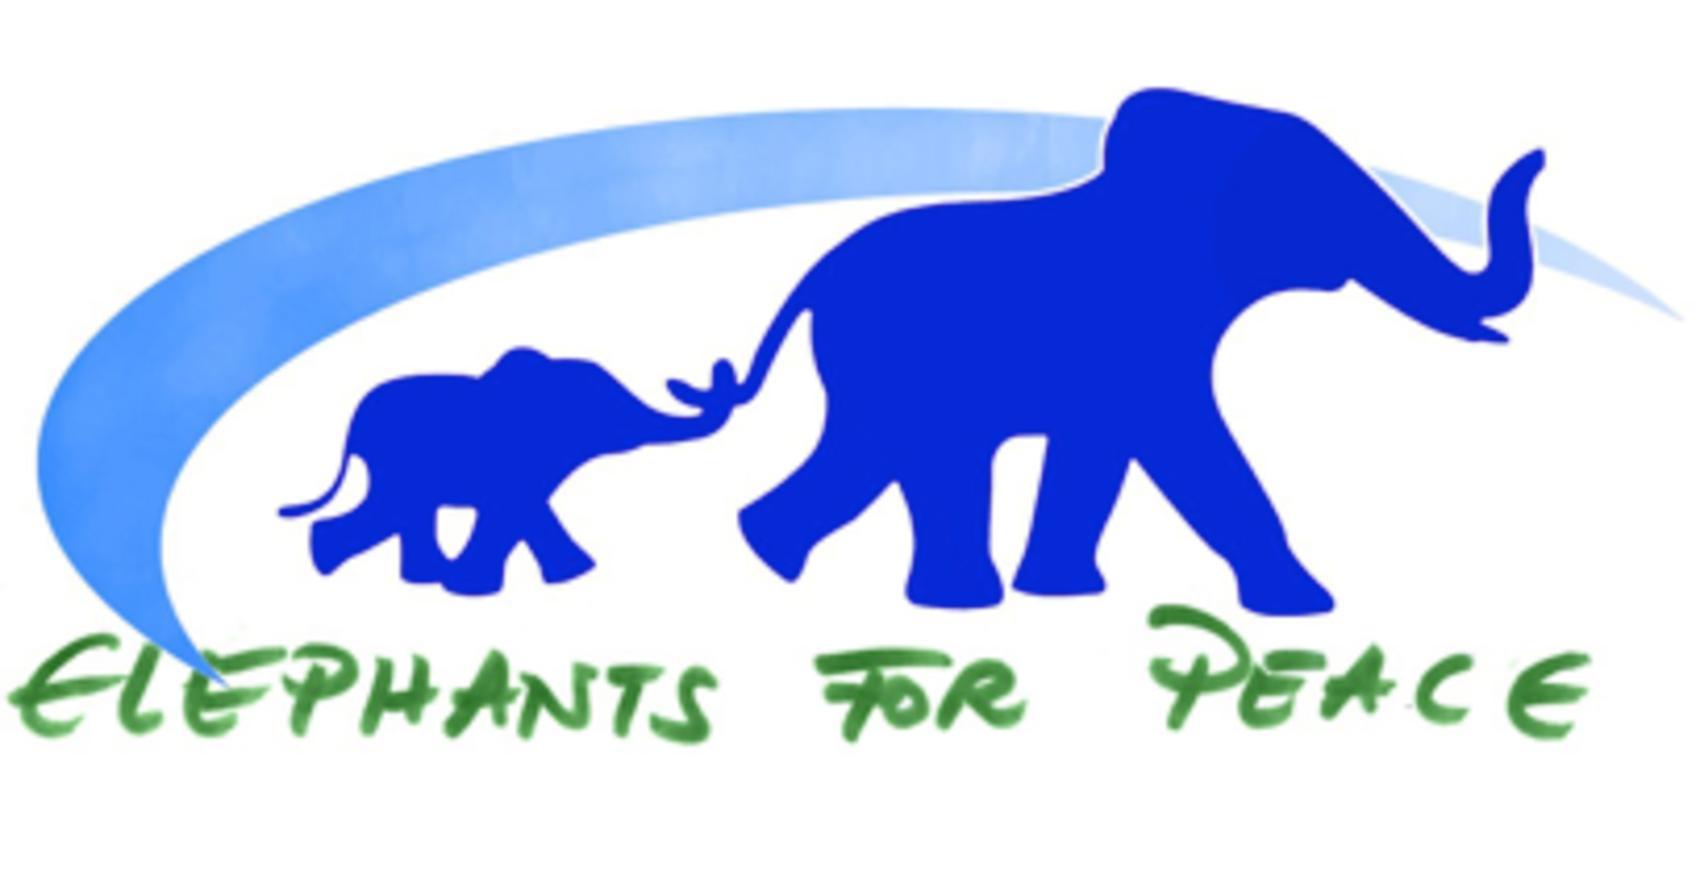 logo for Elephants for Peace